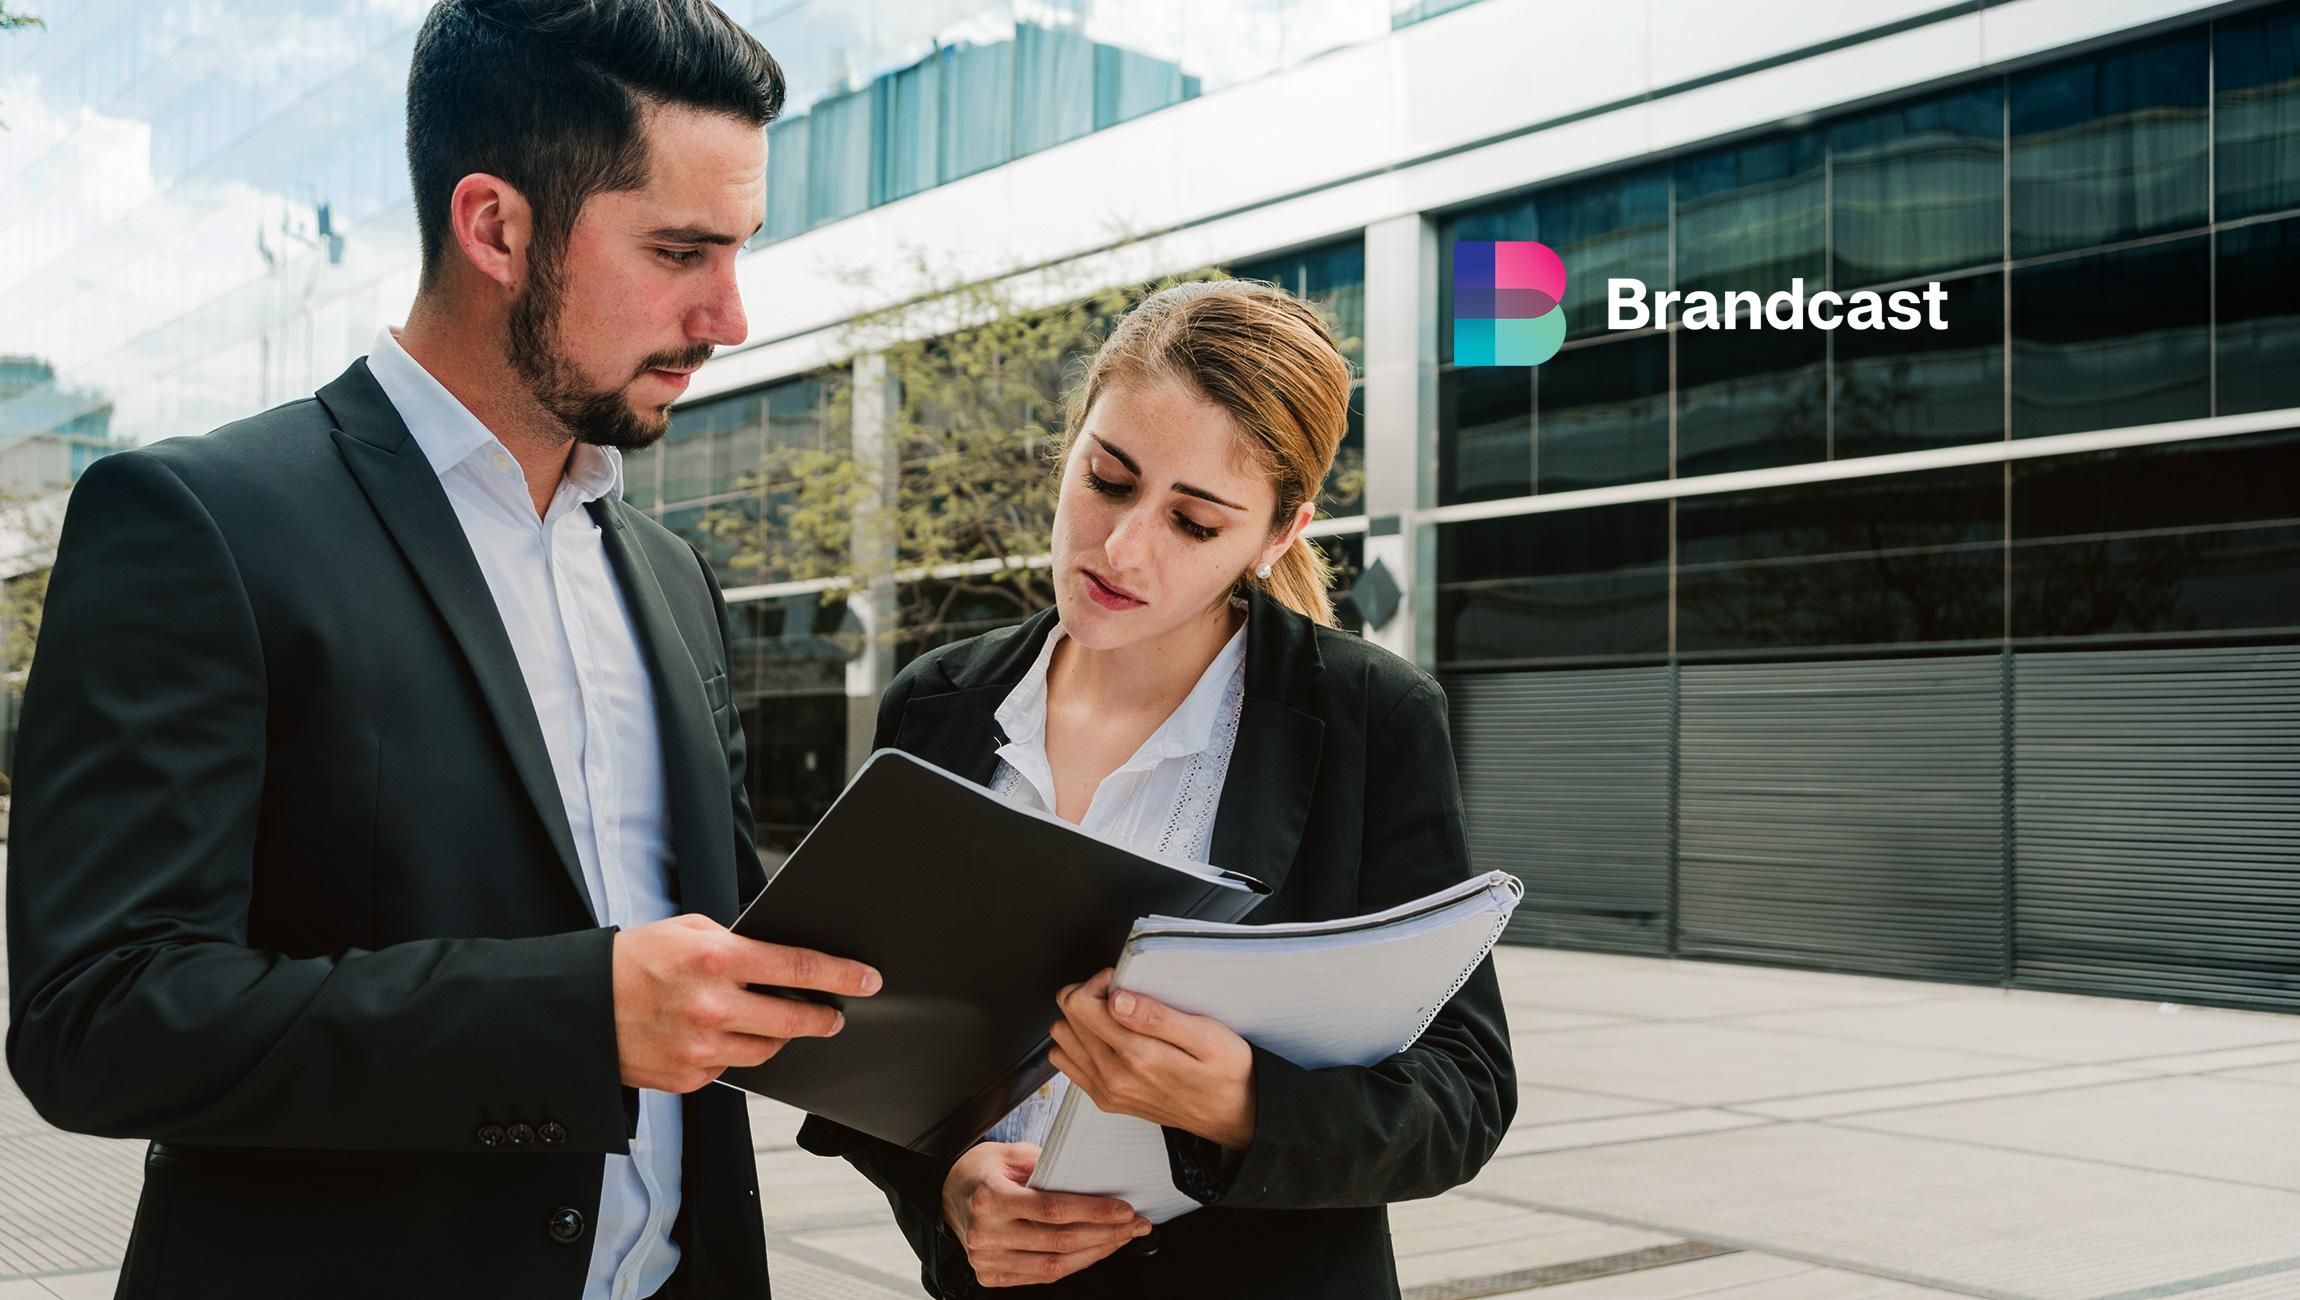 Brandcast Announces Availability on Salesforce AppExchange, the World's Leading Enterprise Apps Marketplace